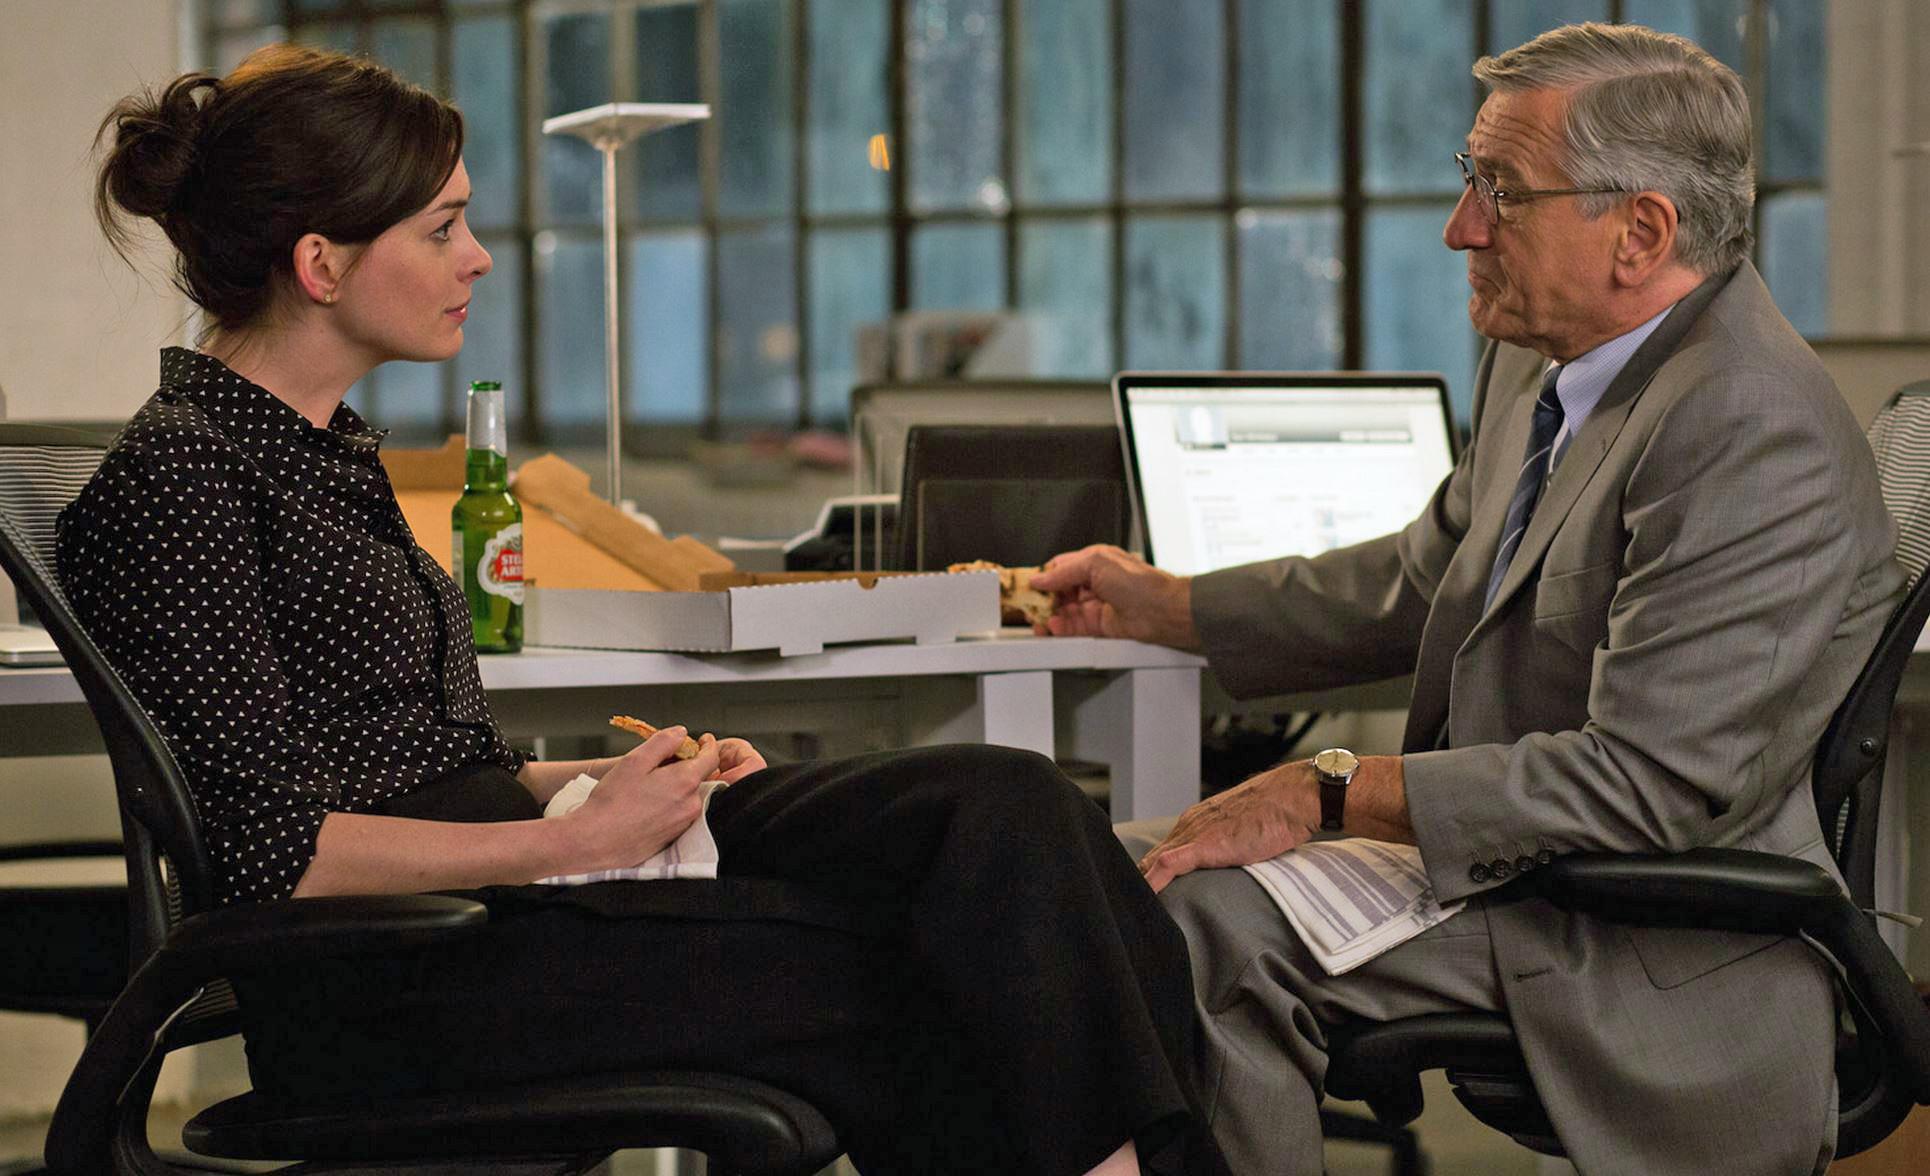 Photo courtesy of theinternmovie.com